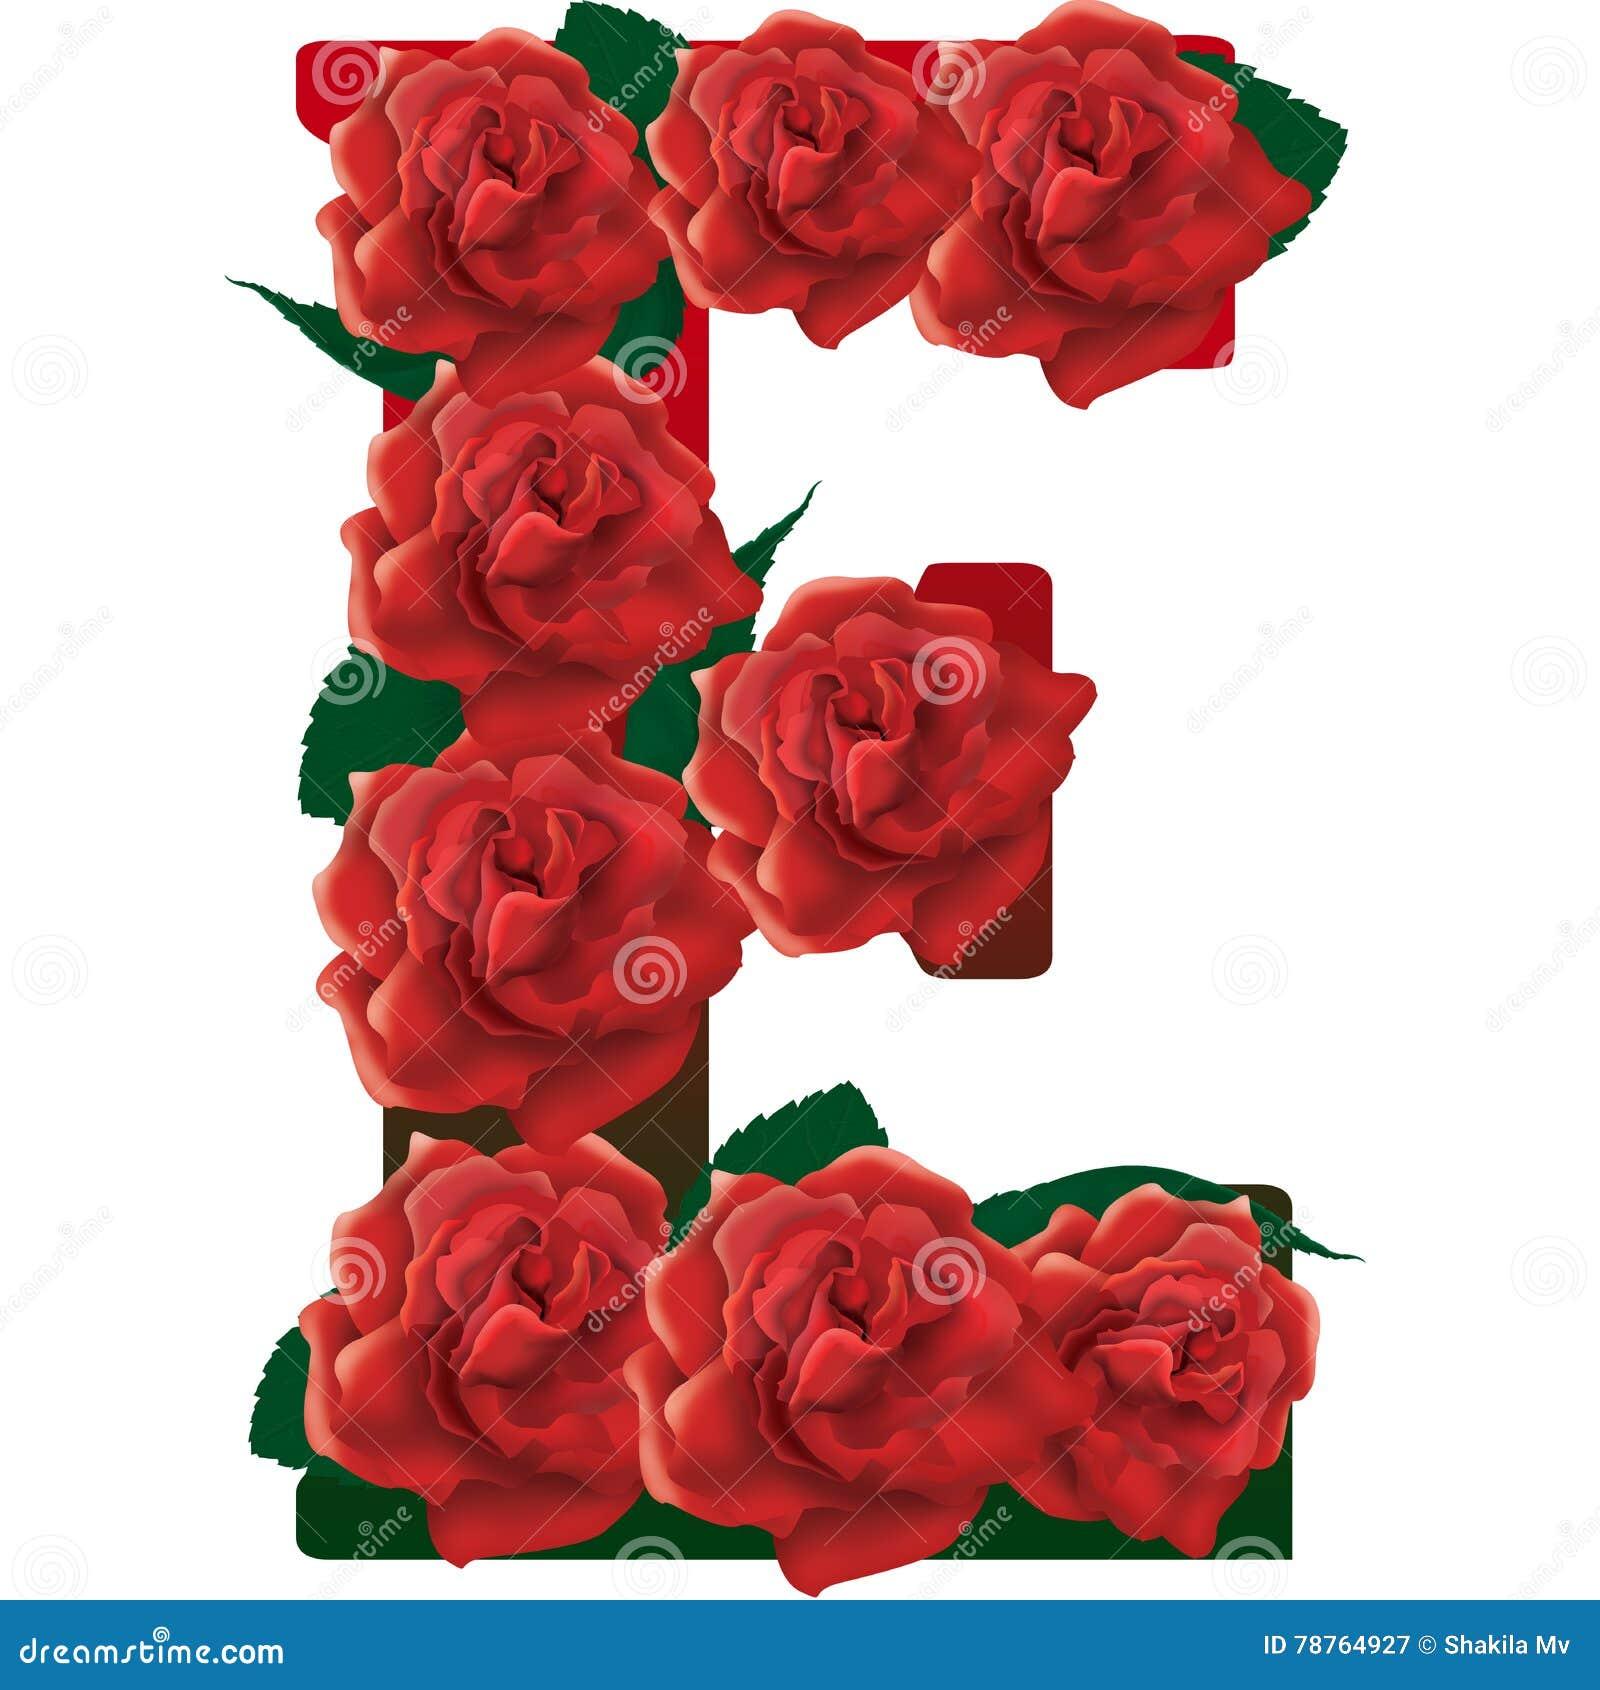 illustration der roten rosen des buchstaben e stockbild illustration von graffiti abbildungen. Black Bedroom Furniture Sets. Home Design Ideas